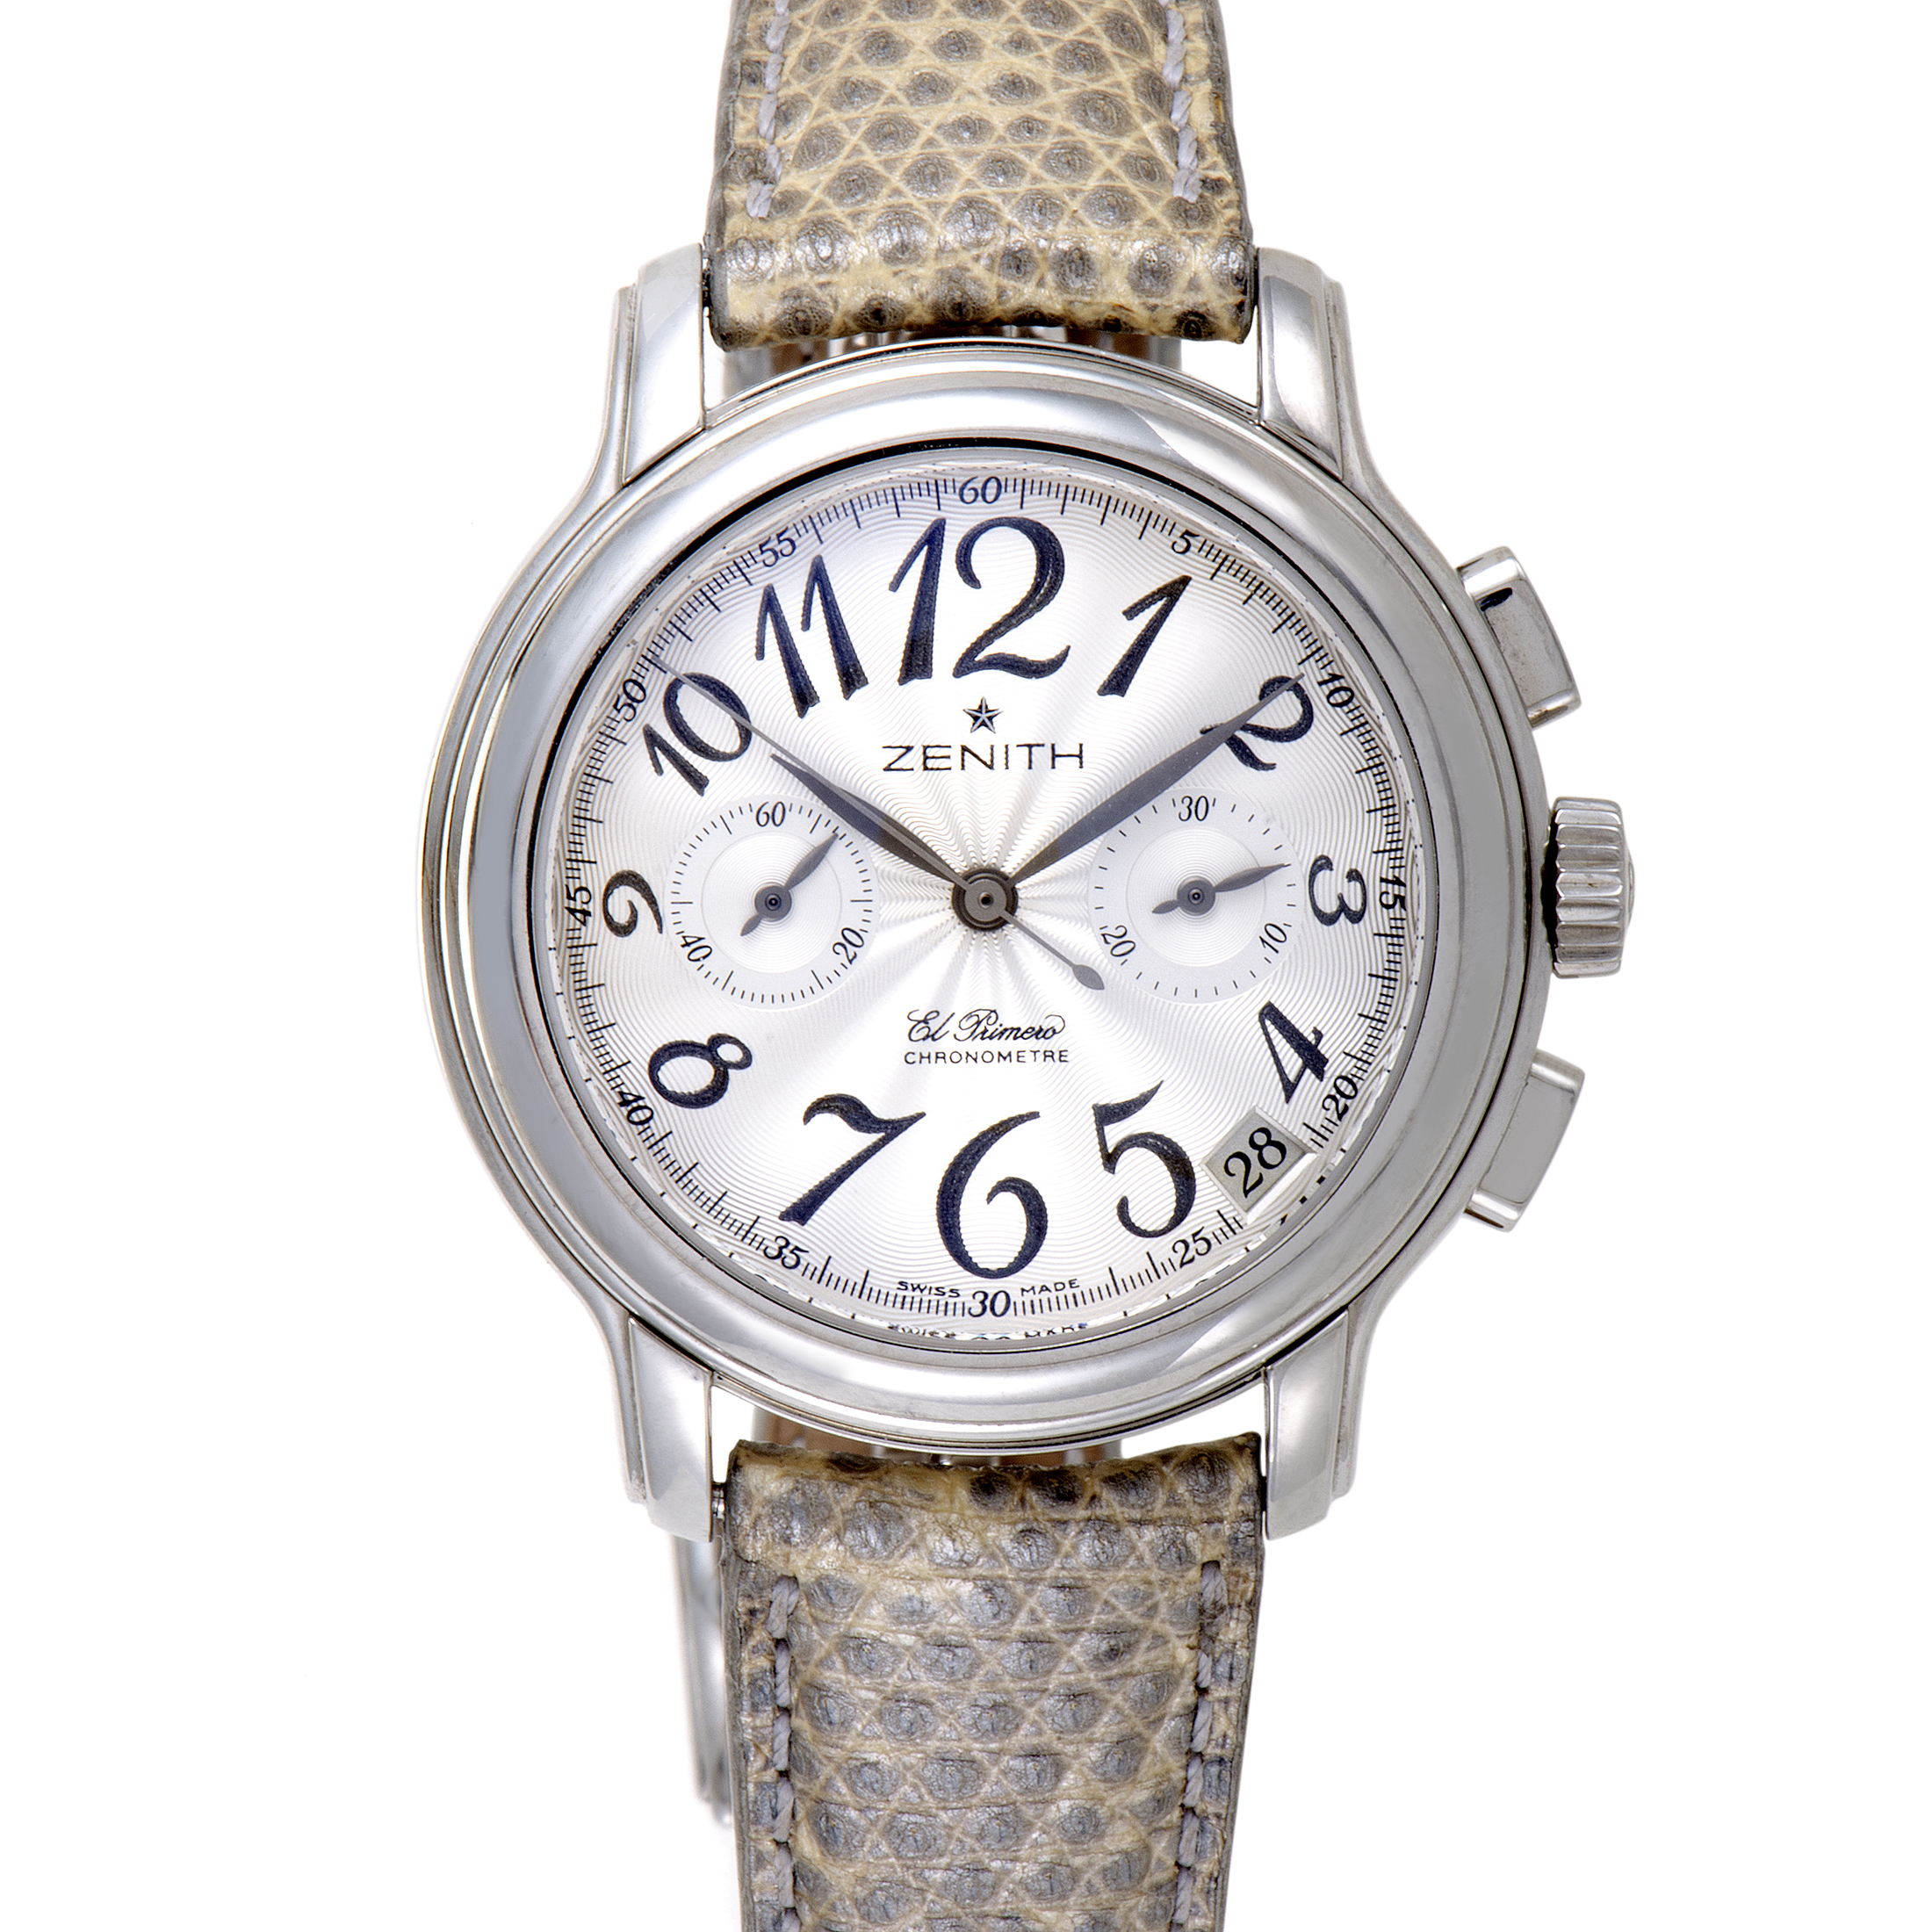 Chronomaster Star El Primero Womens Watch 03.1230.4002/01.c508